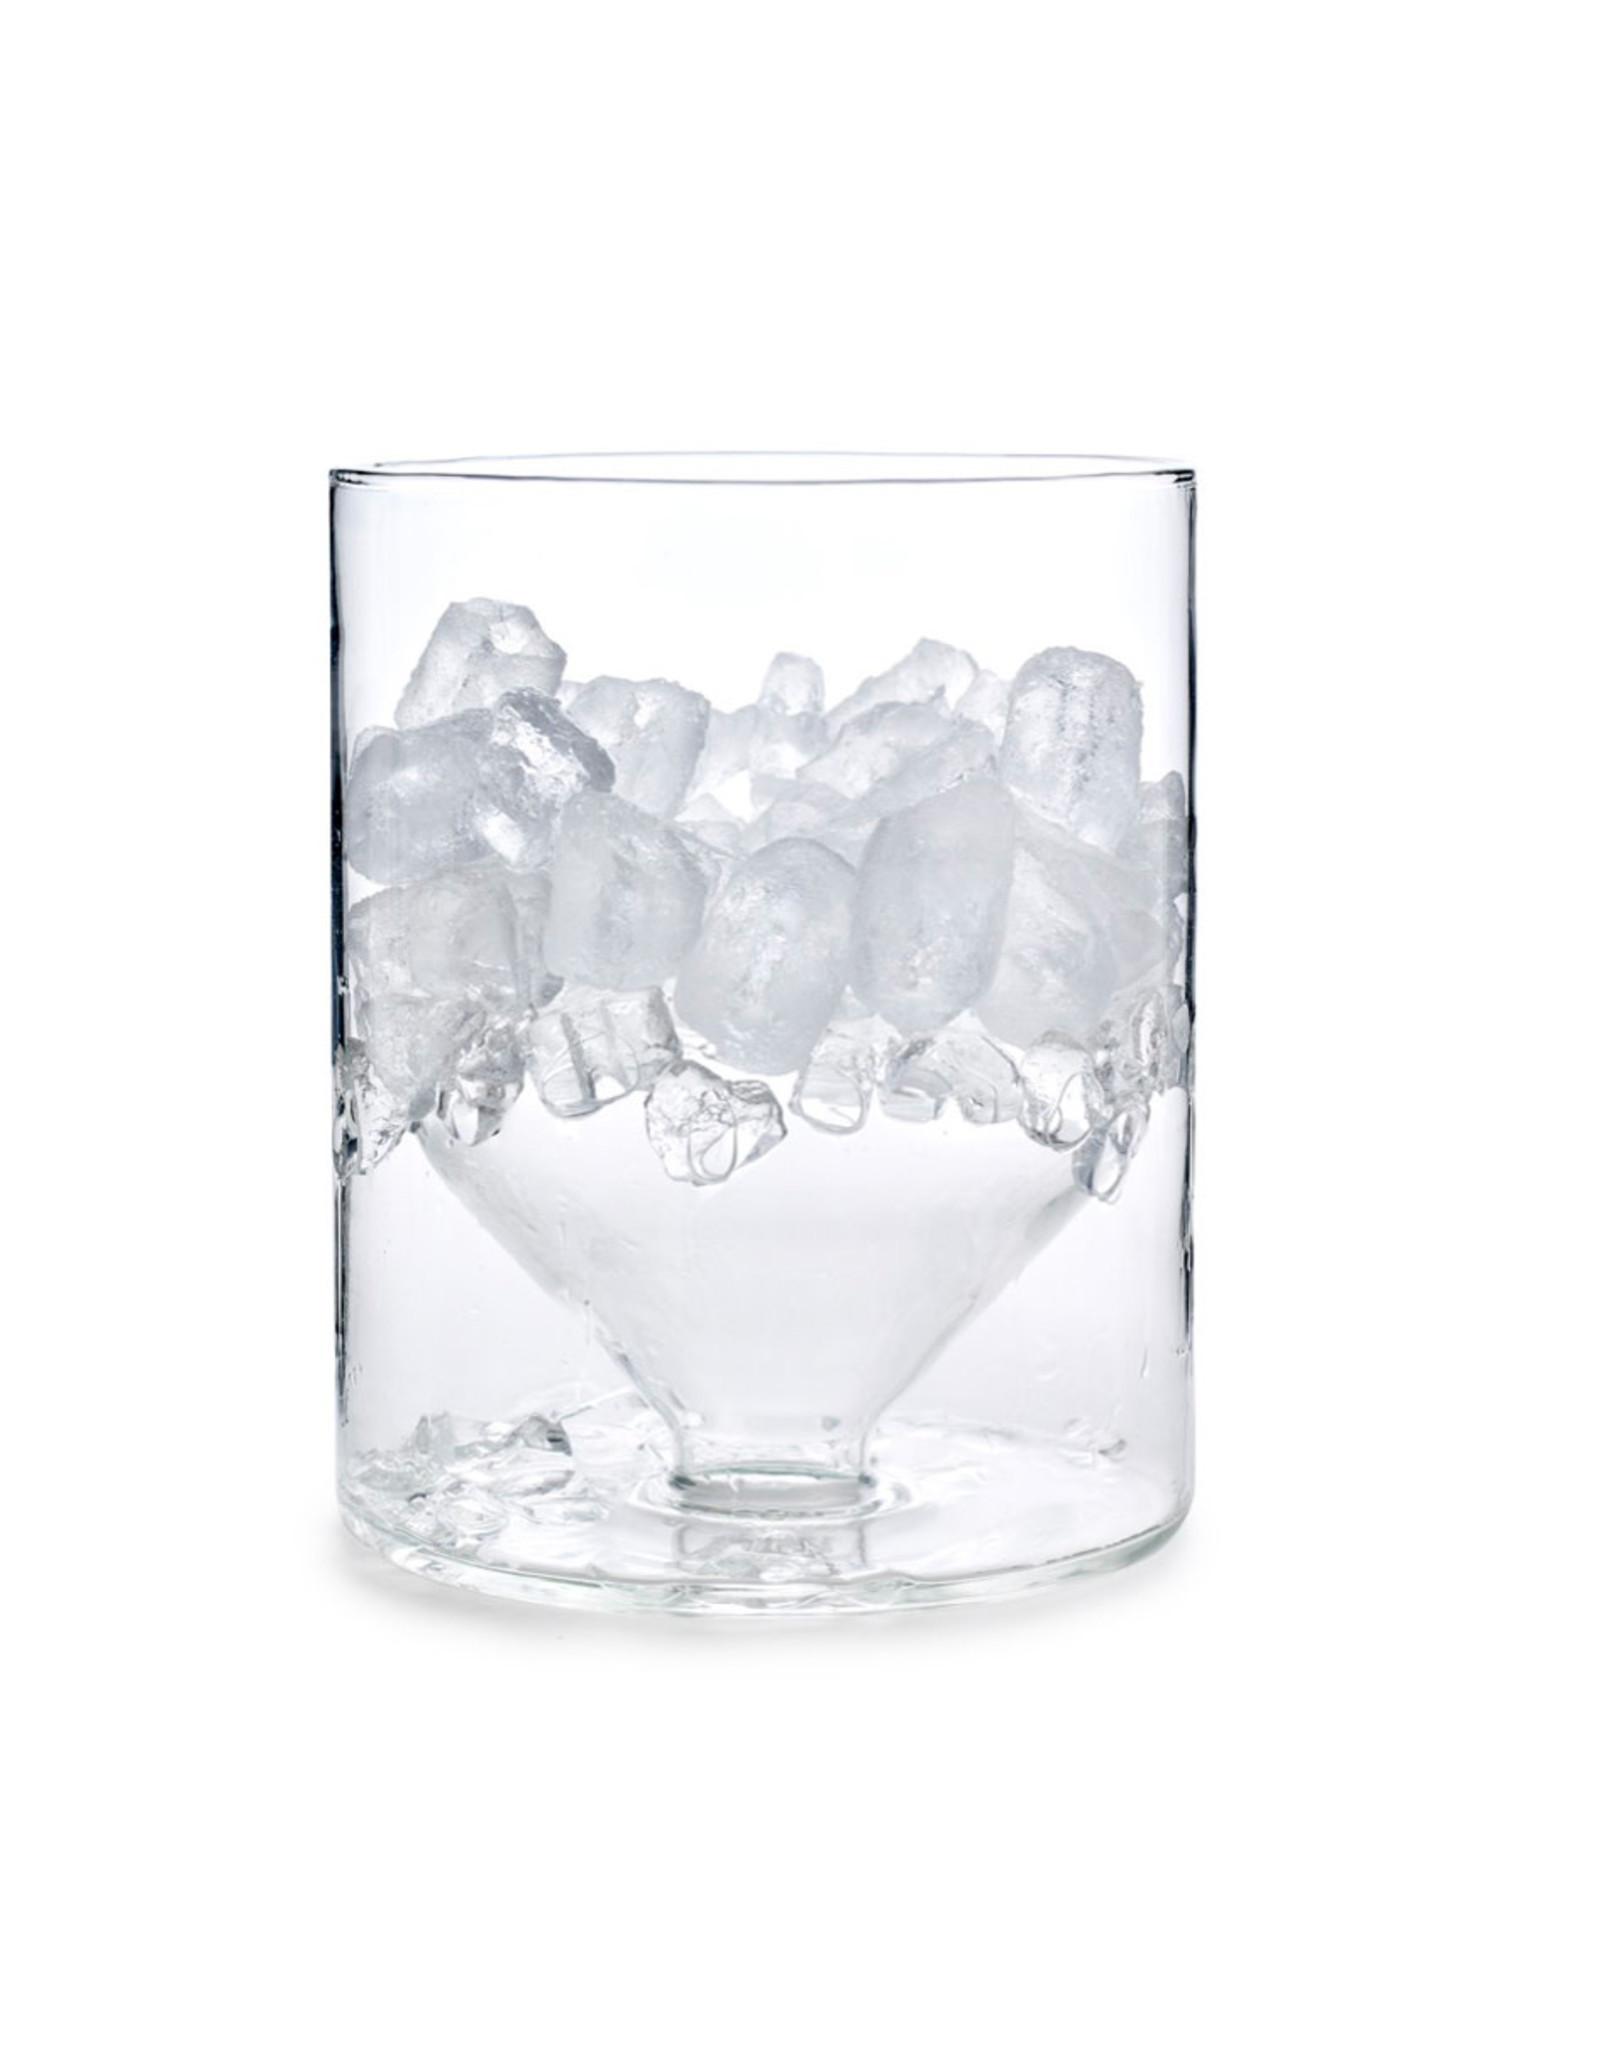 Rodolfo Dordoni Icicle Ice Bucket